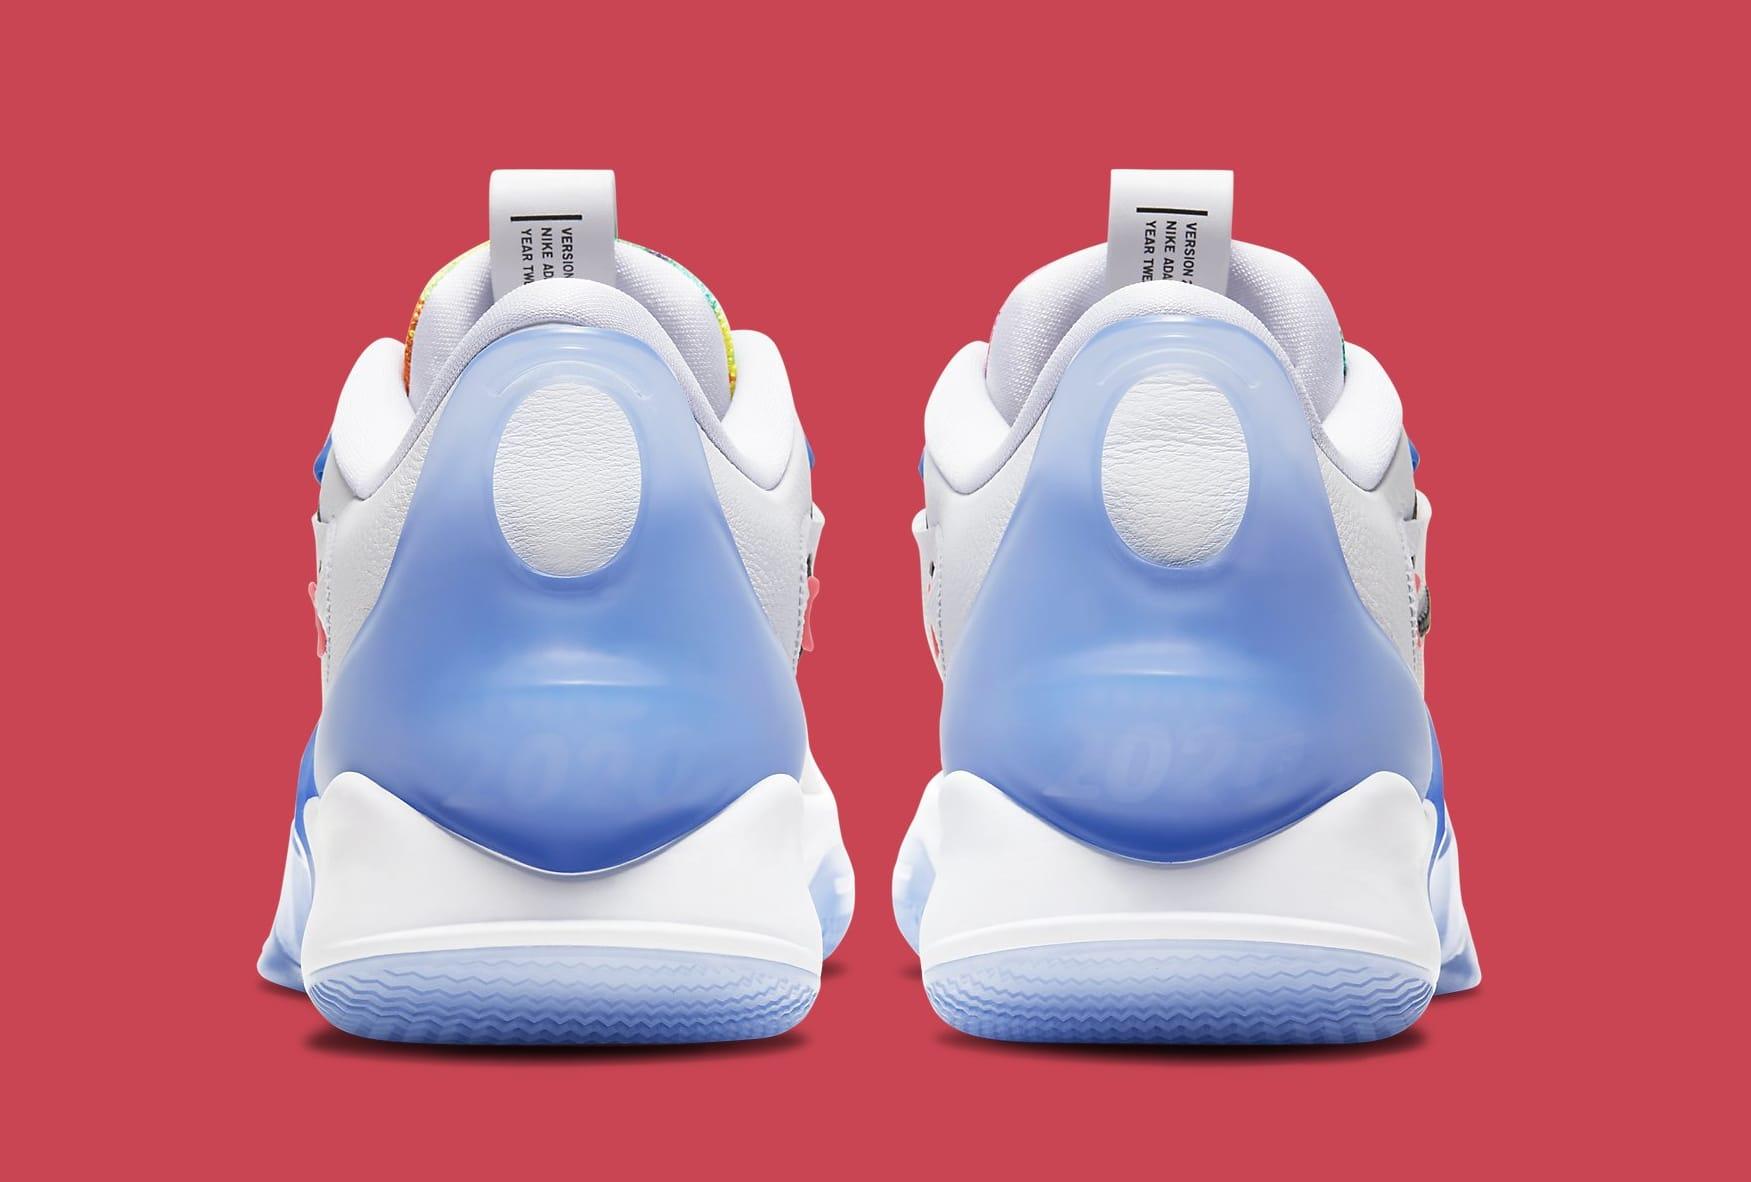 Nike Adapt BB 2.0 'Tie-Dye' BQ5397-100 Heel